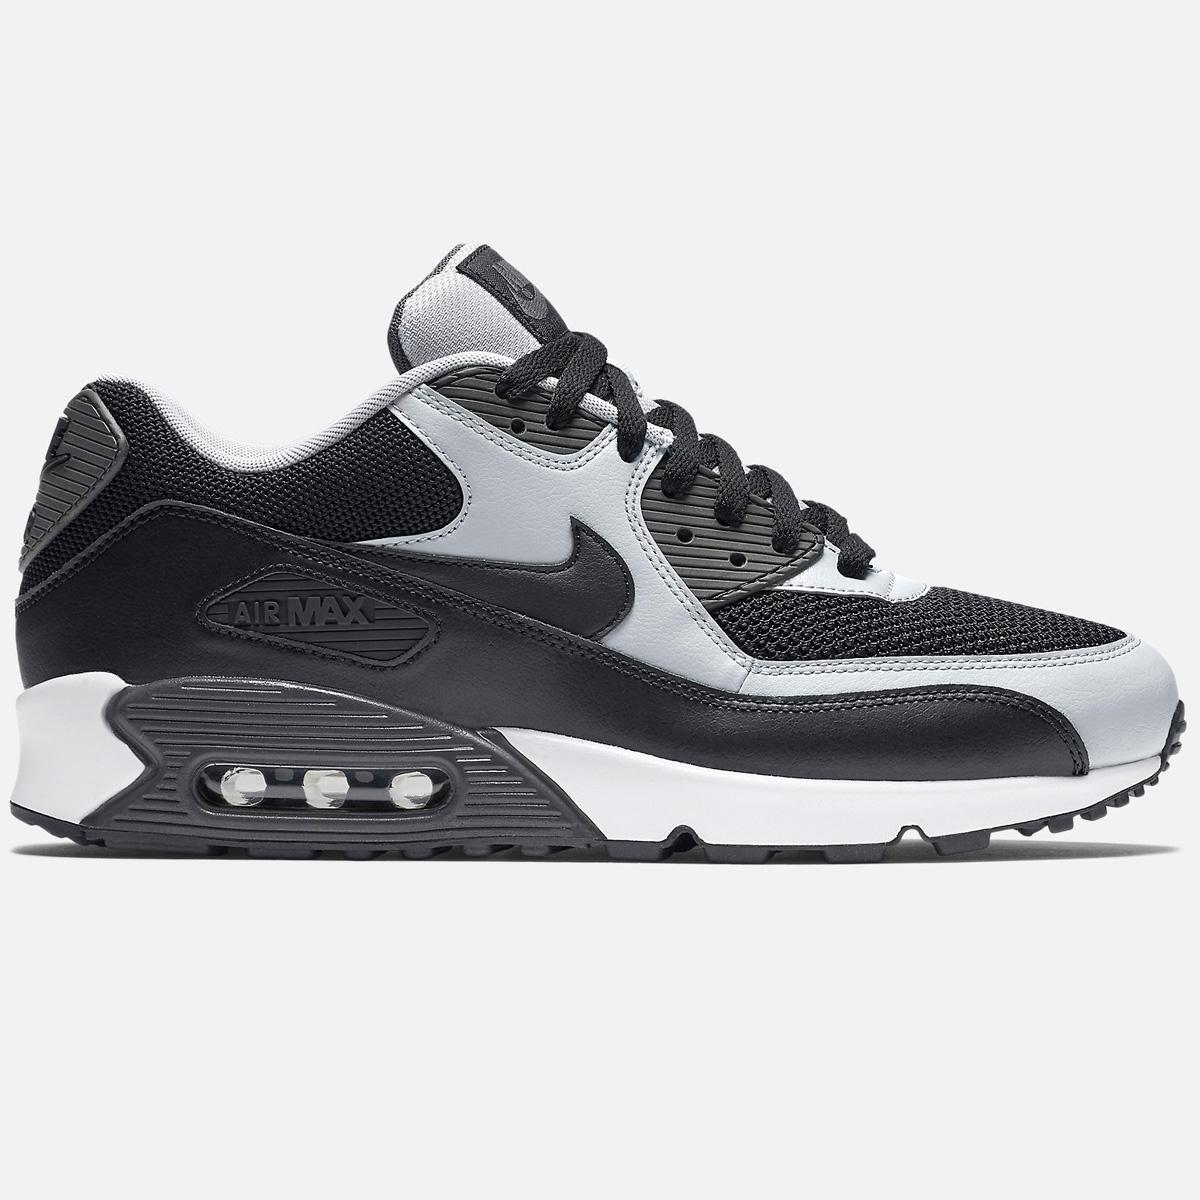 Nike Air Max 2017 Cool GreyAnthracite Dark Grey Men's